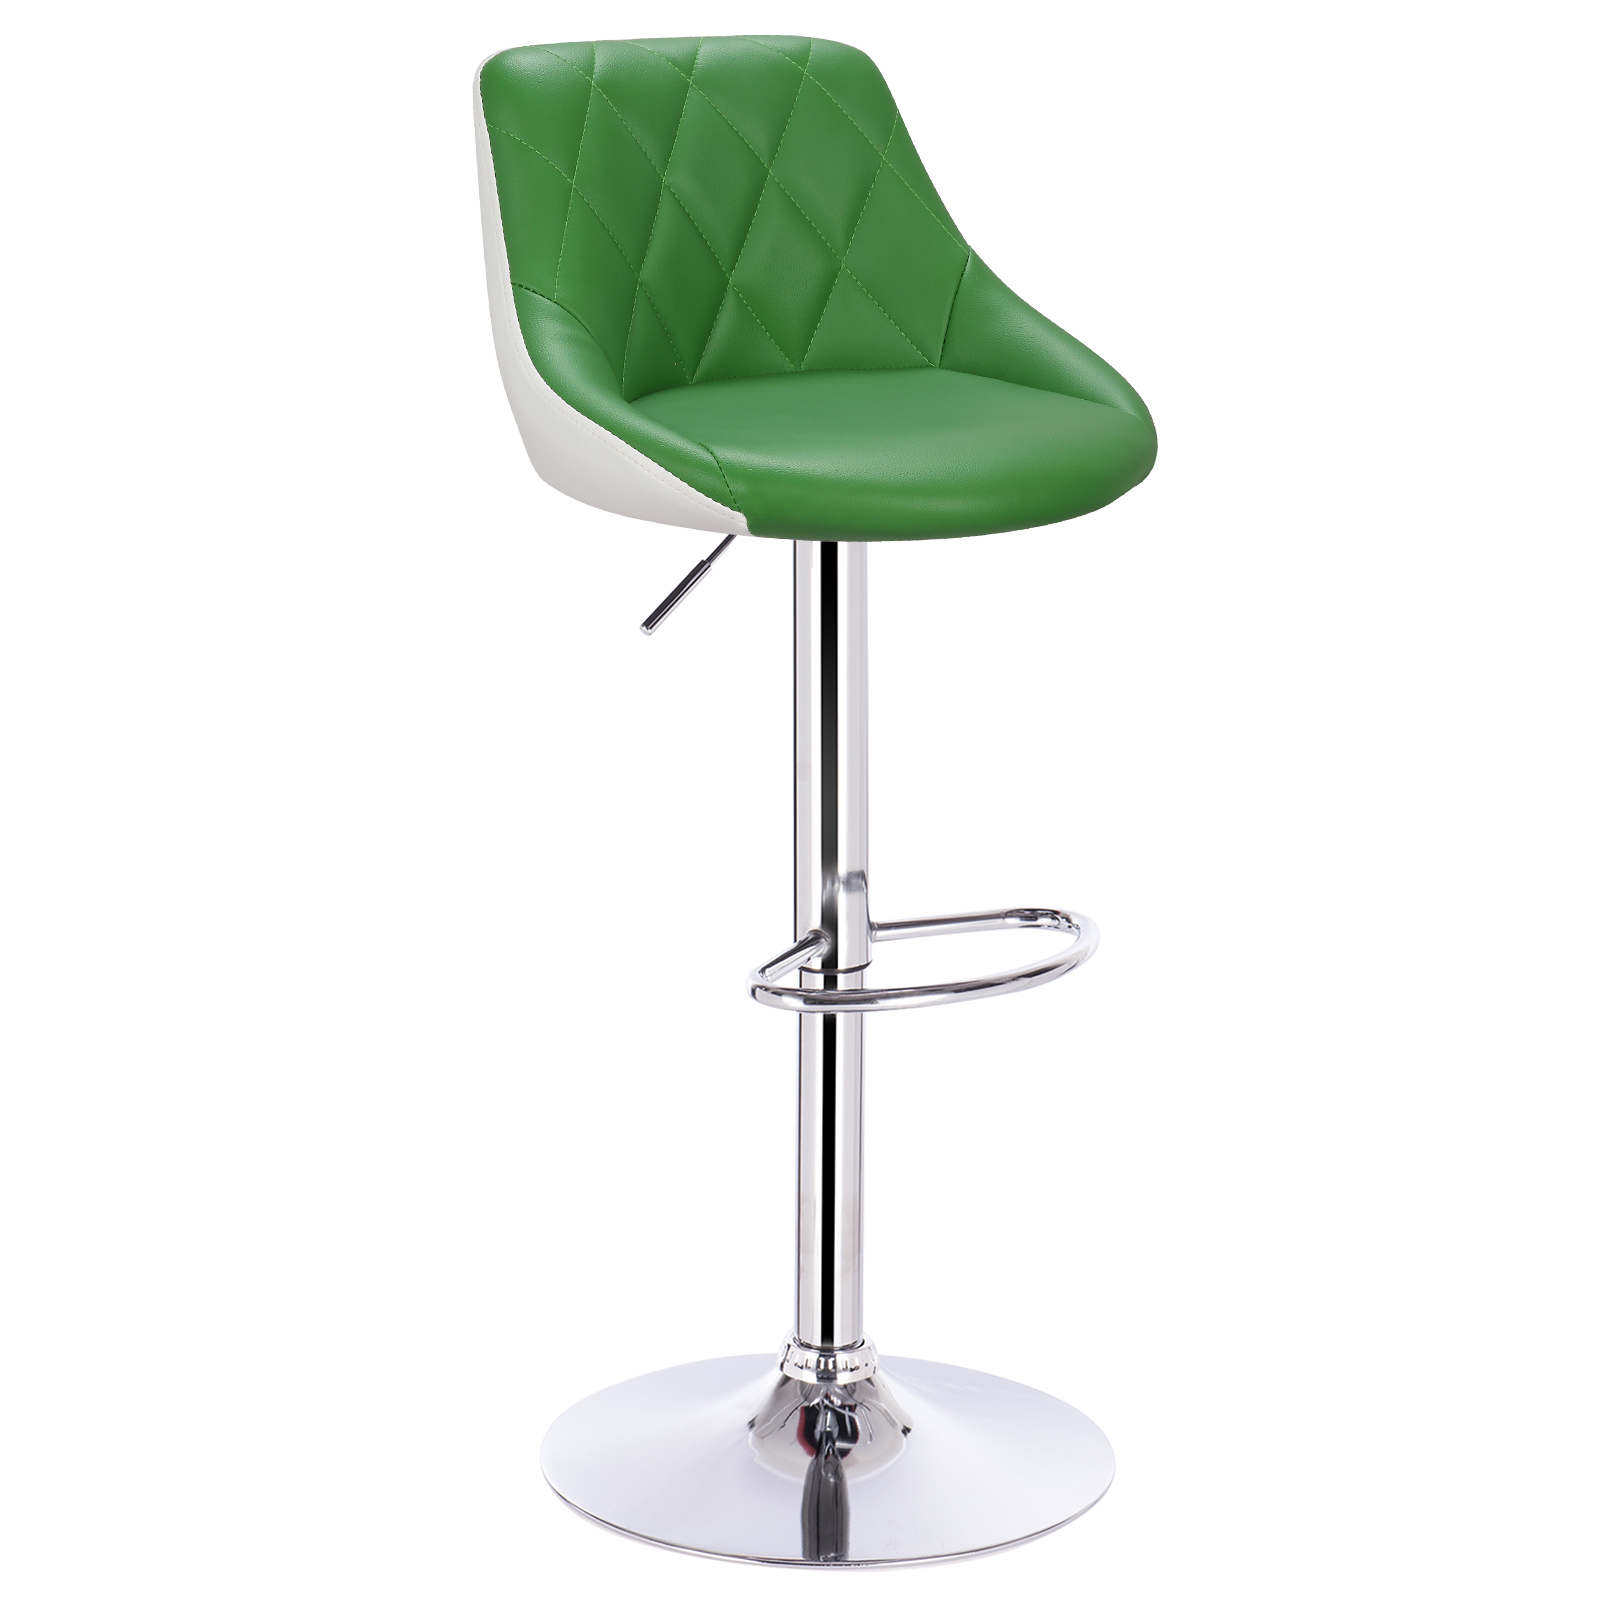 barhocker tresenstuhl hocker mit lehne h henverstellbar kunstleder metall 1051 ebay. Black Bedroom Furniture Sets. Home Design Ideas